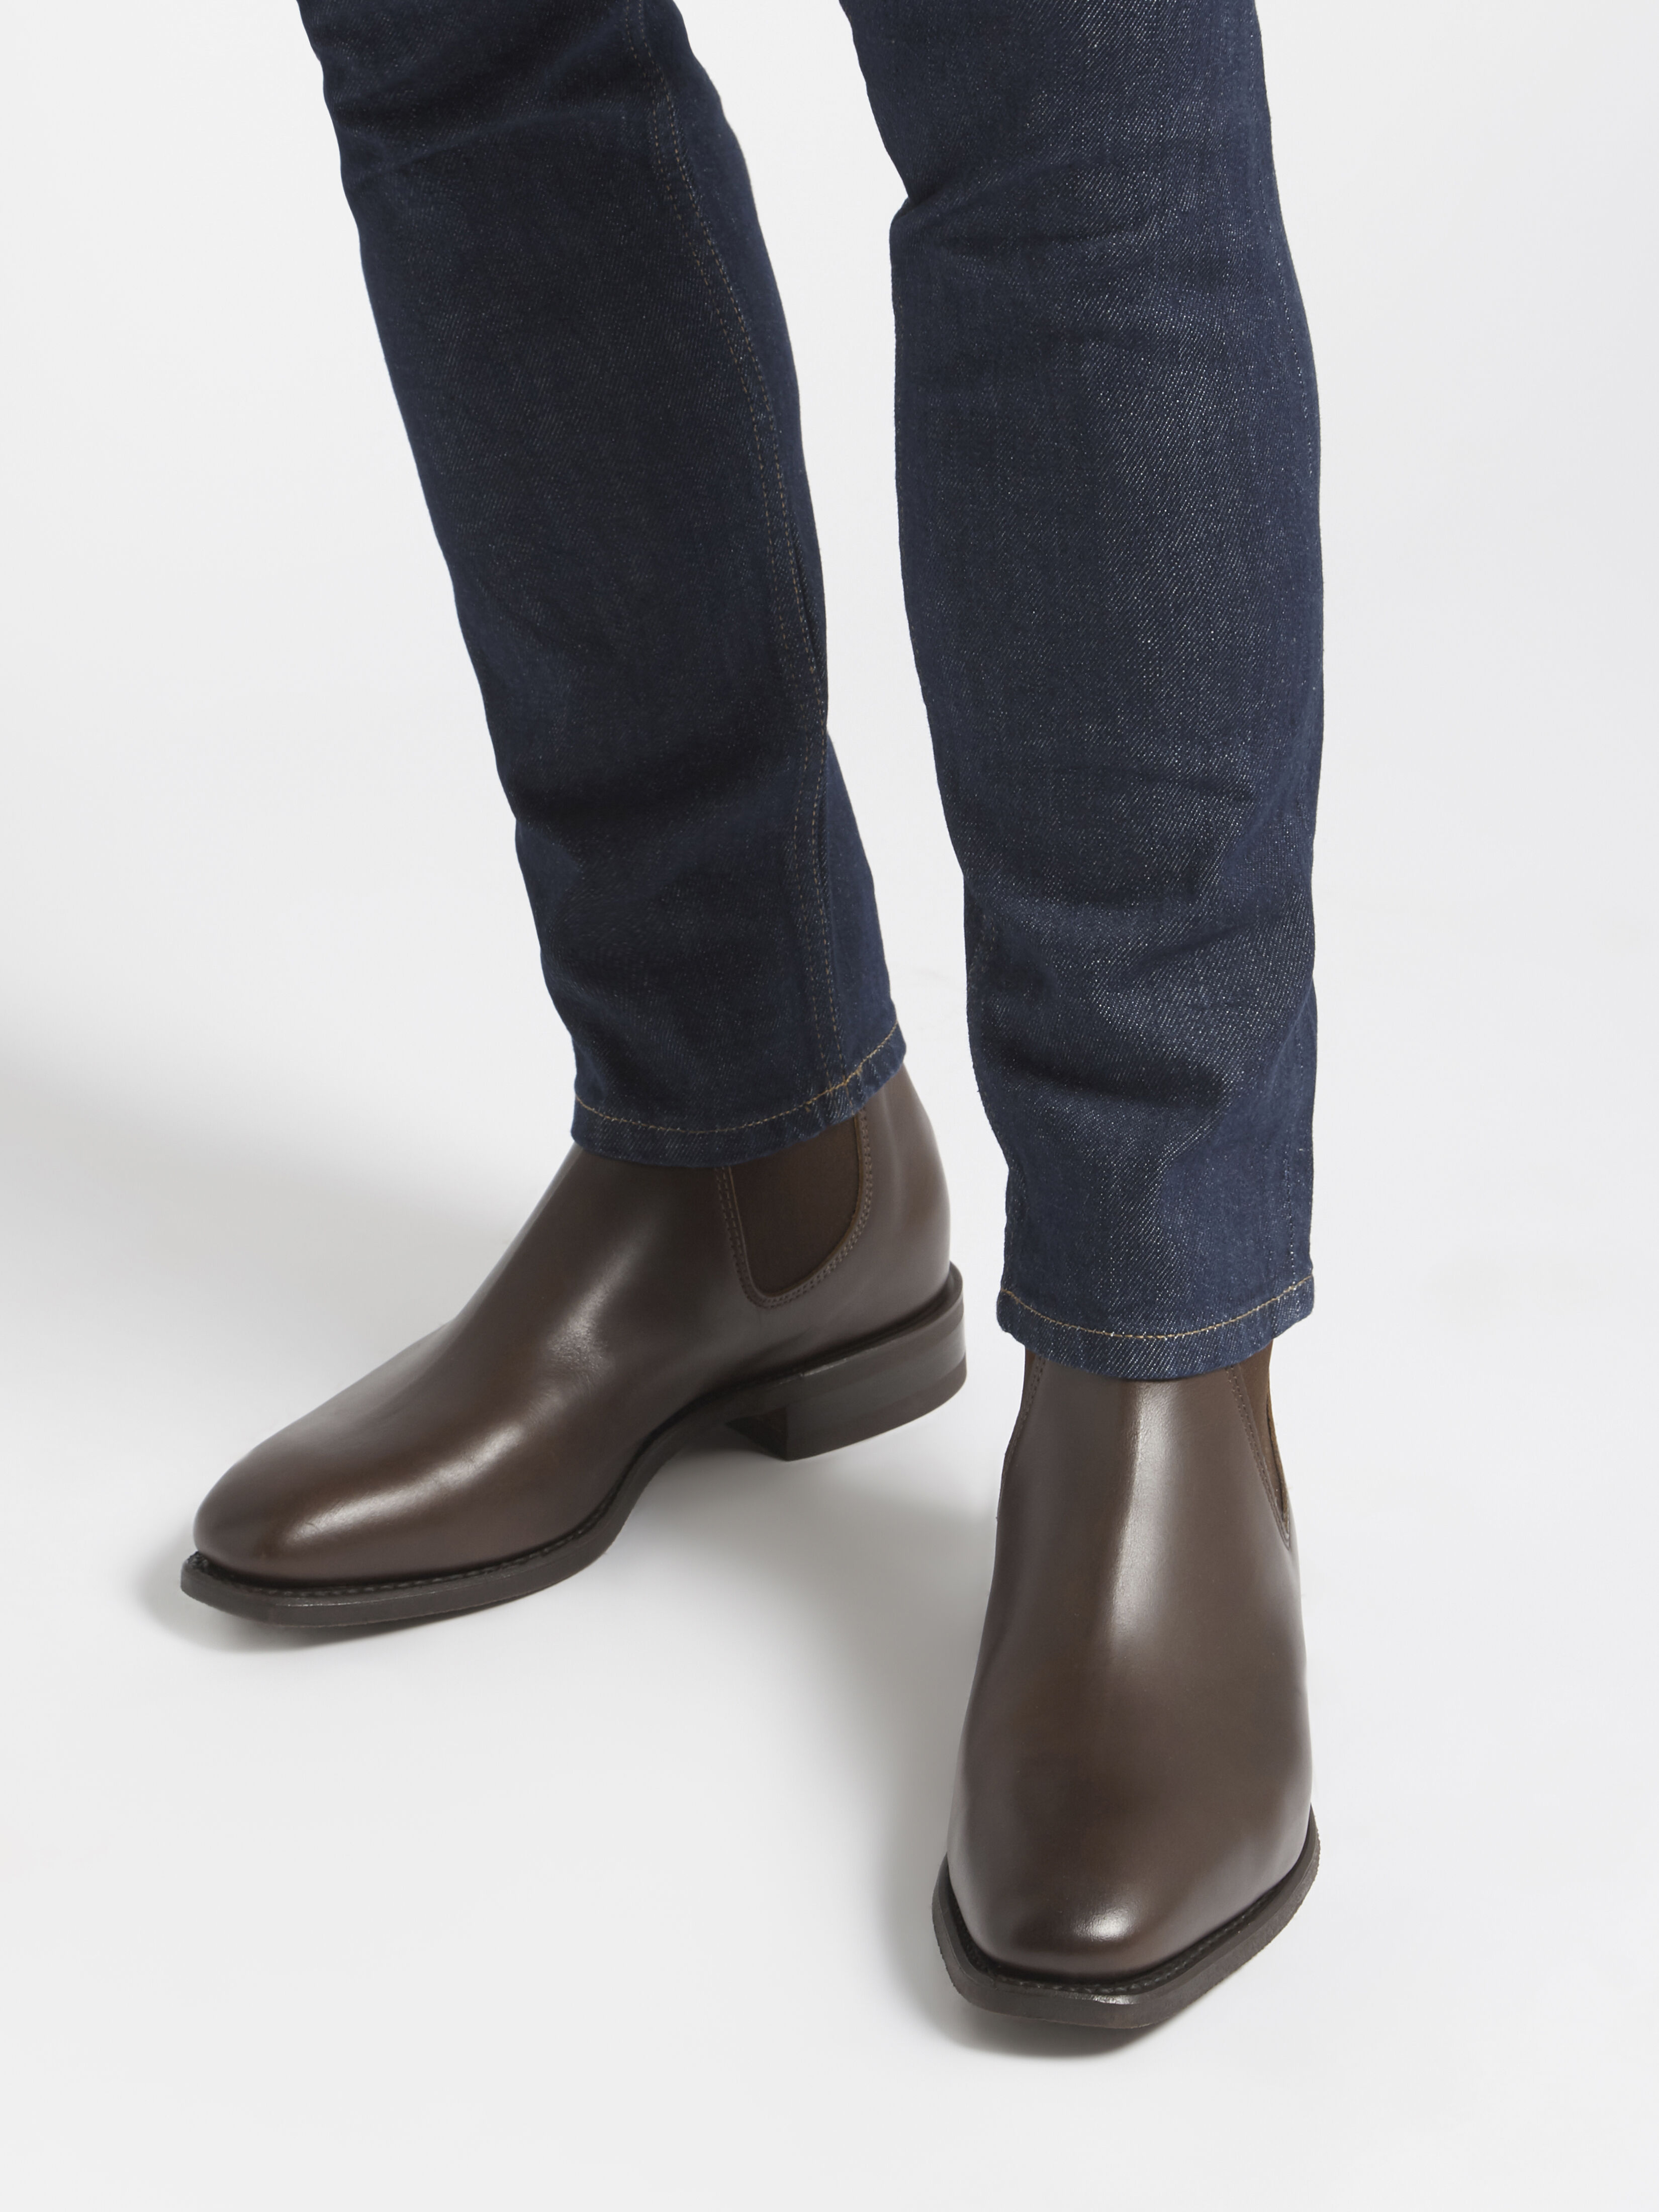 Men's Leather \u0026 Suede Boots | R.M.Williams®